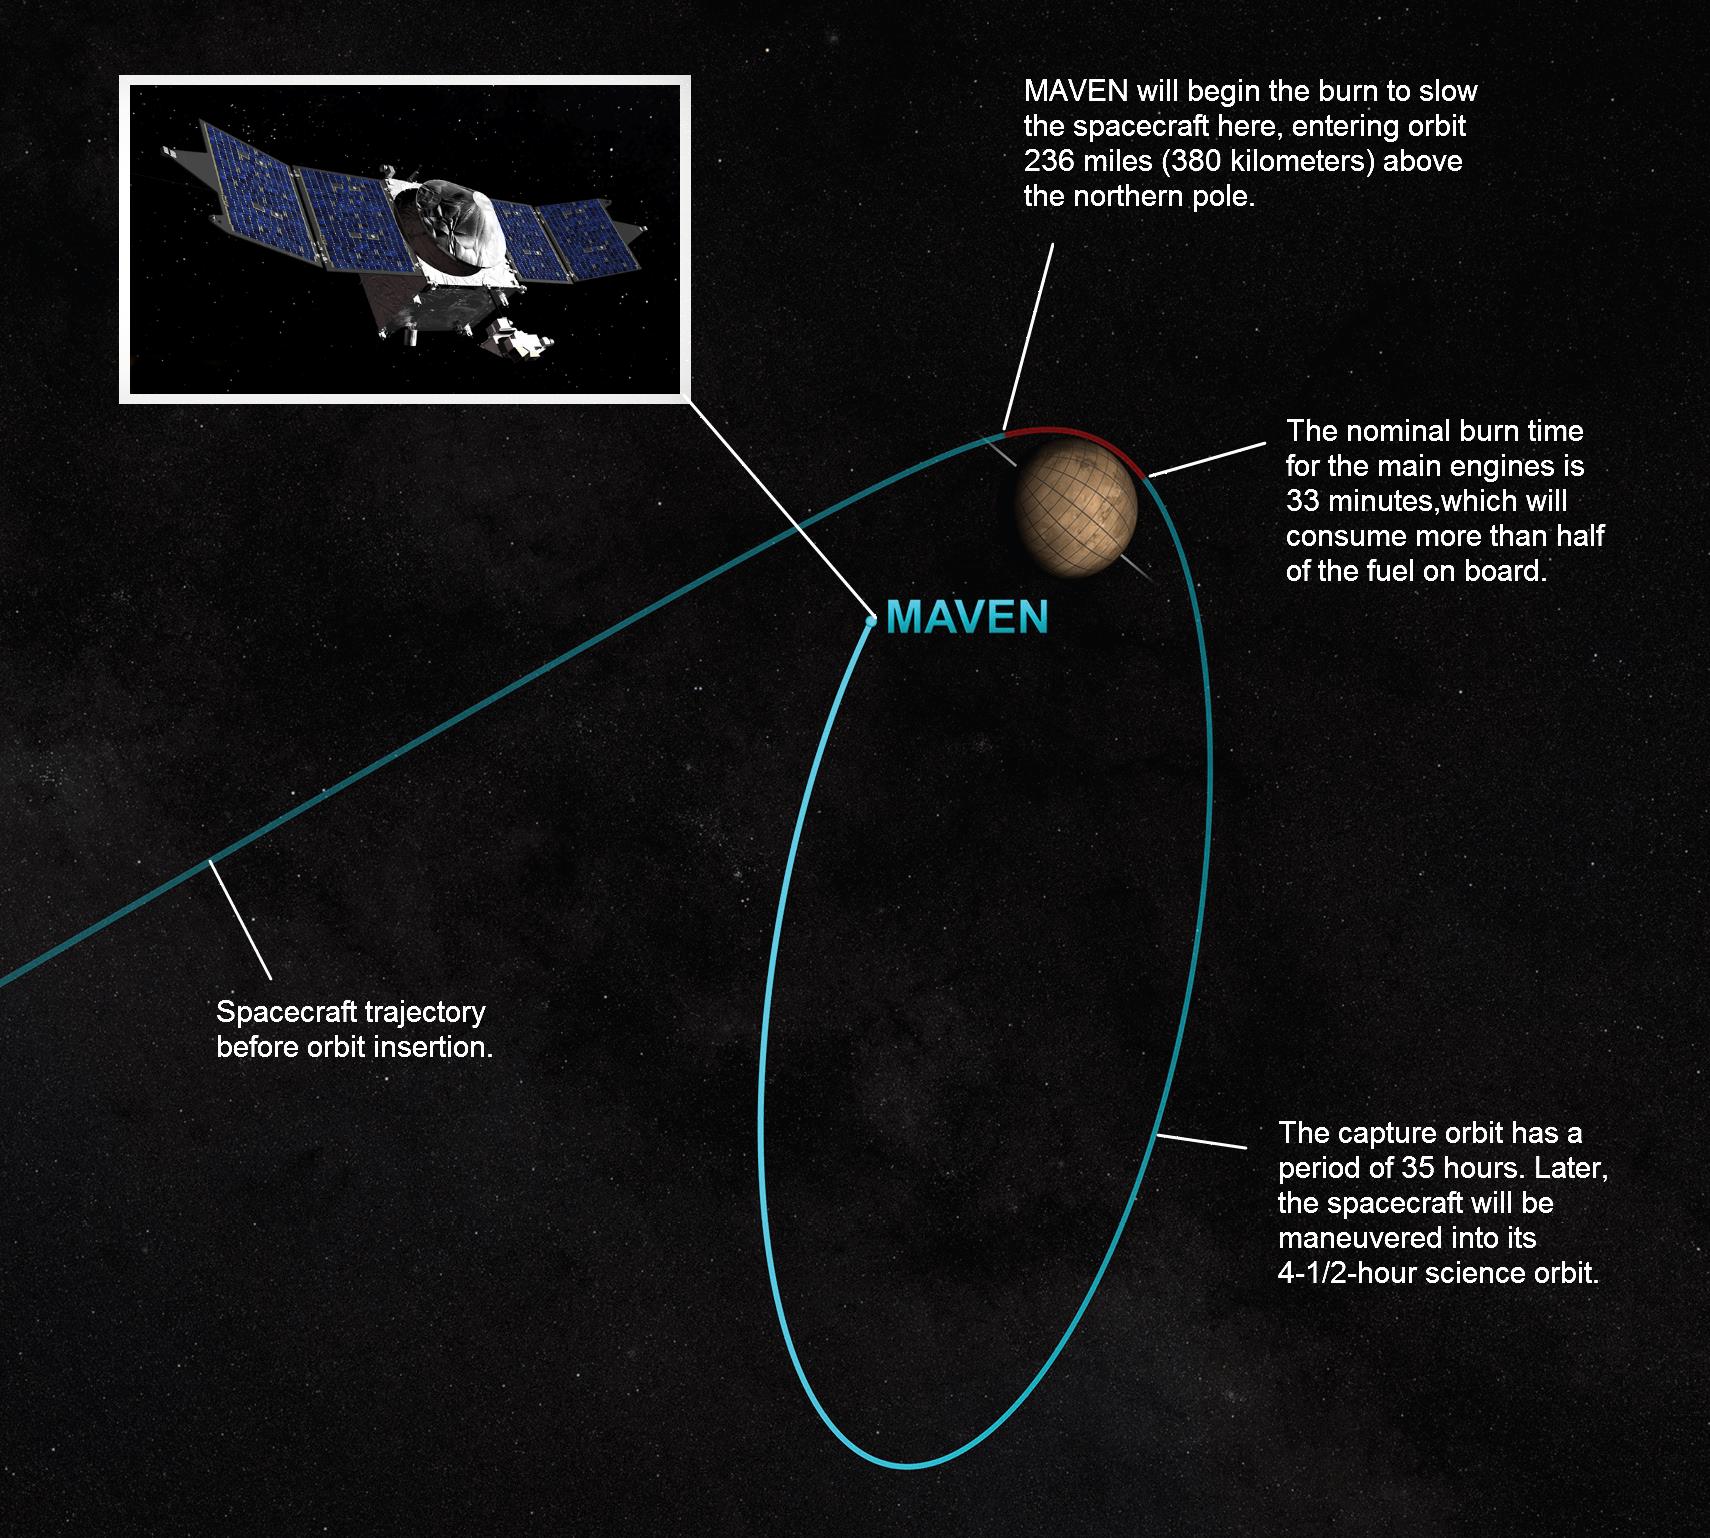 MarsMaven-Orbit-Insertion-142540-20140917.png